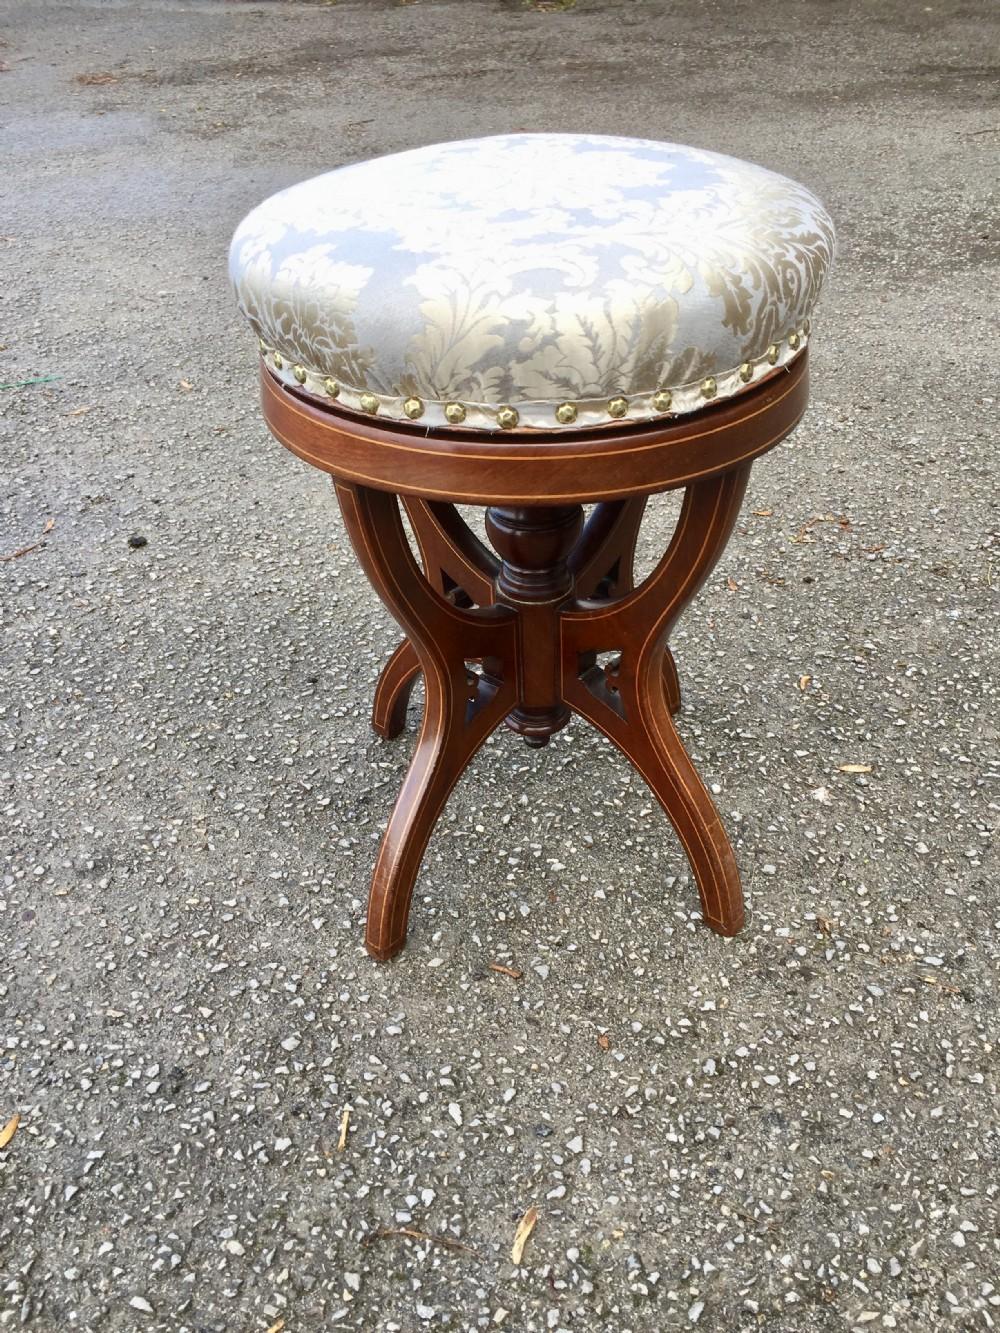 nineteenth century inlaid mahogany height adjustable circular piano stool